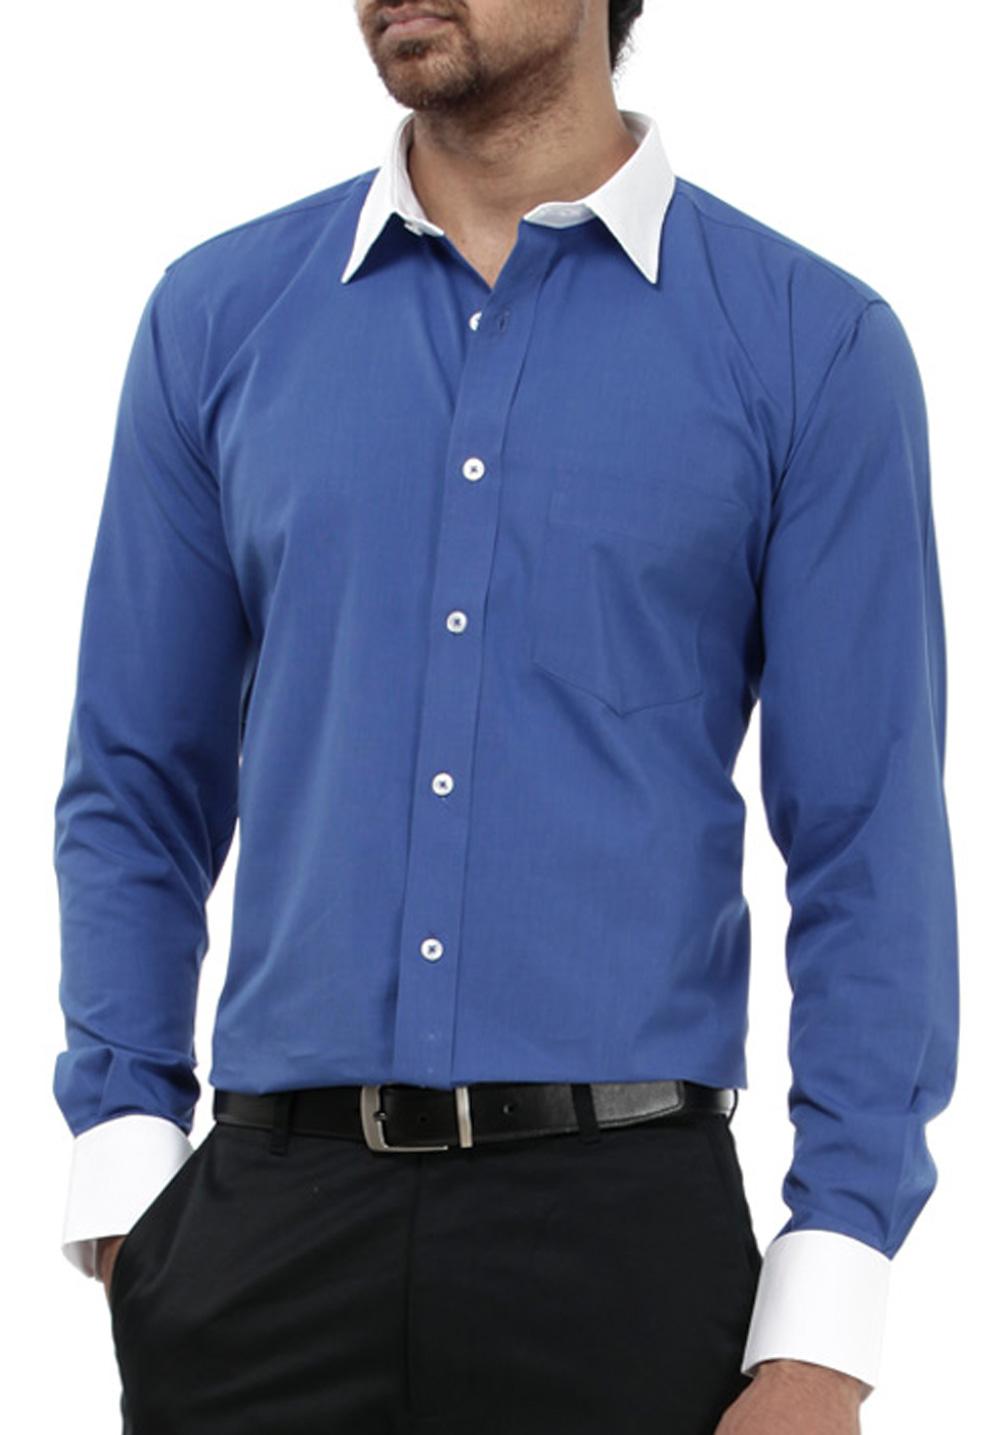 Men&-39-s Contrast Cuff Dress Shirts- Men&-39-s Contrast Cuff Dress Shirts ...